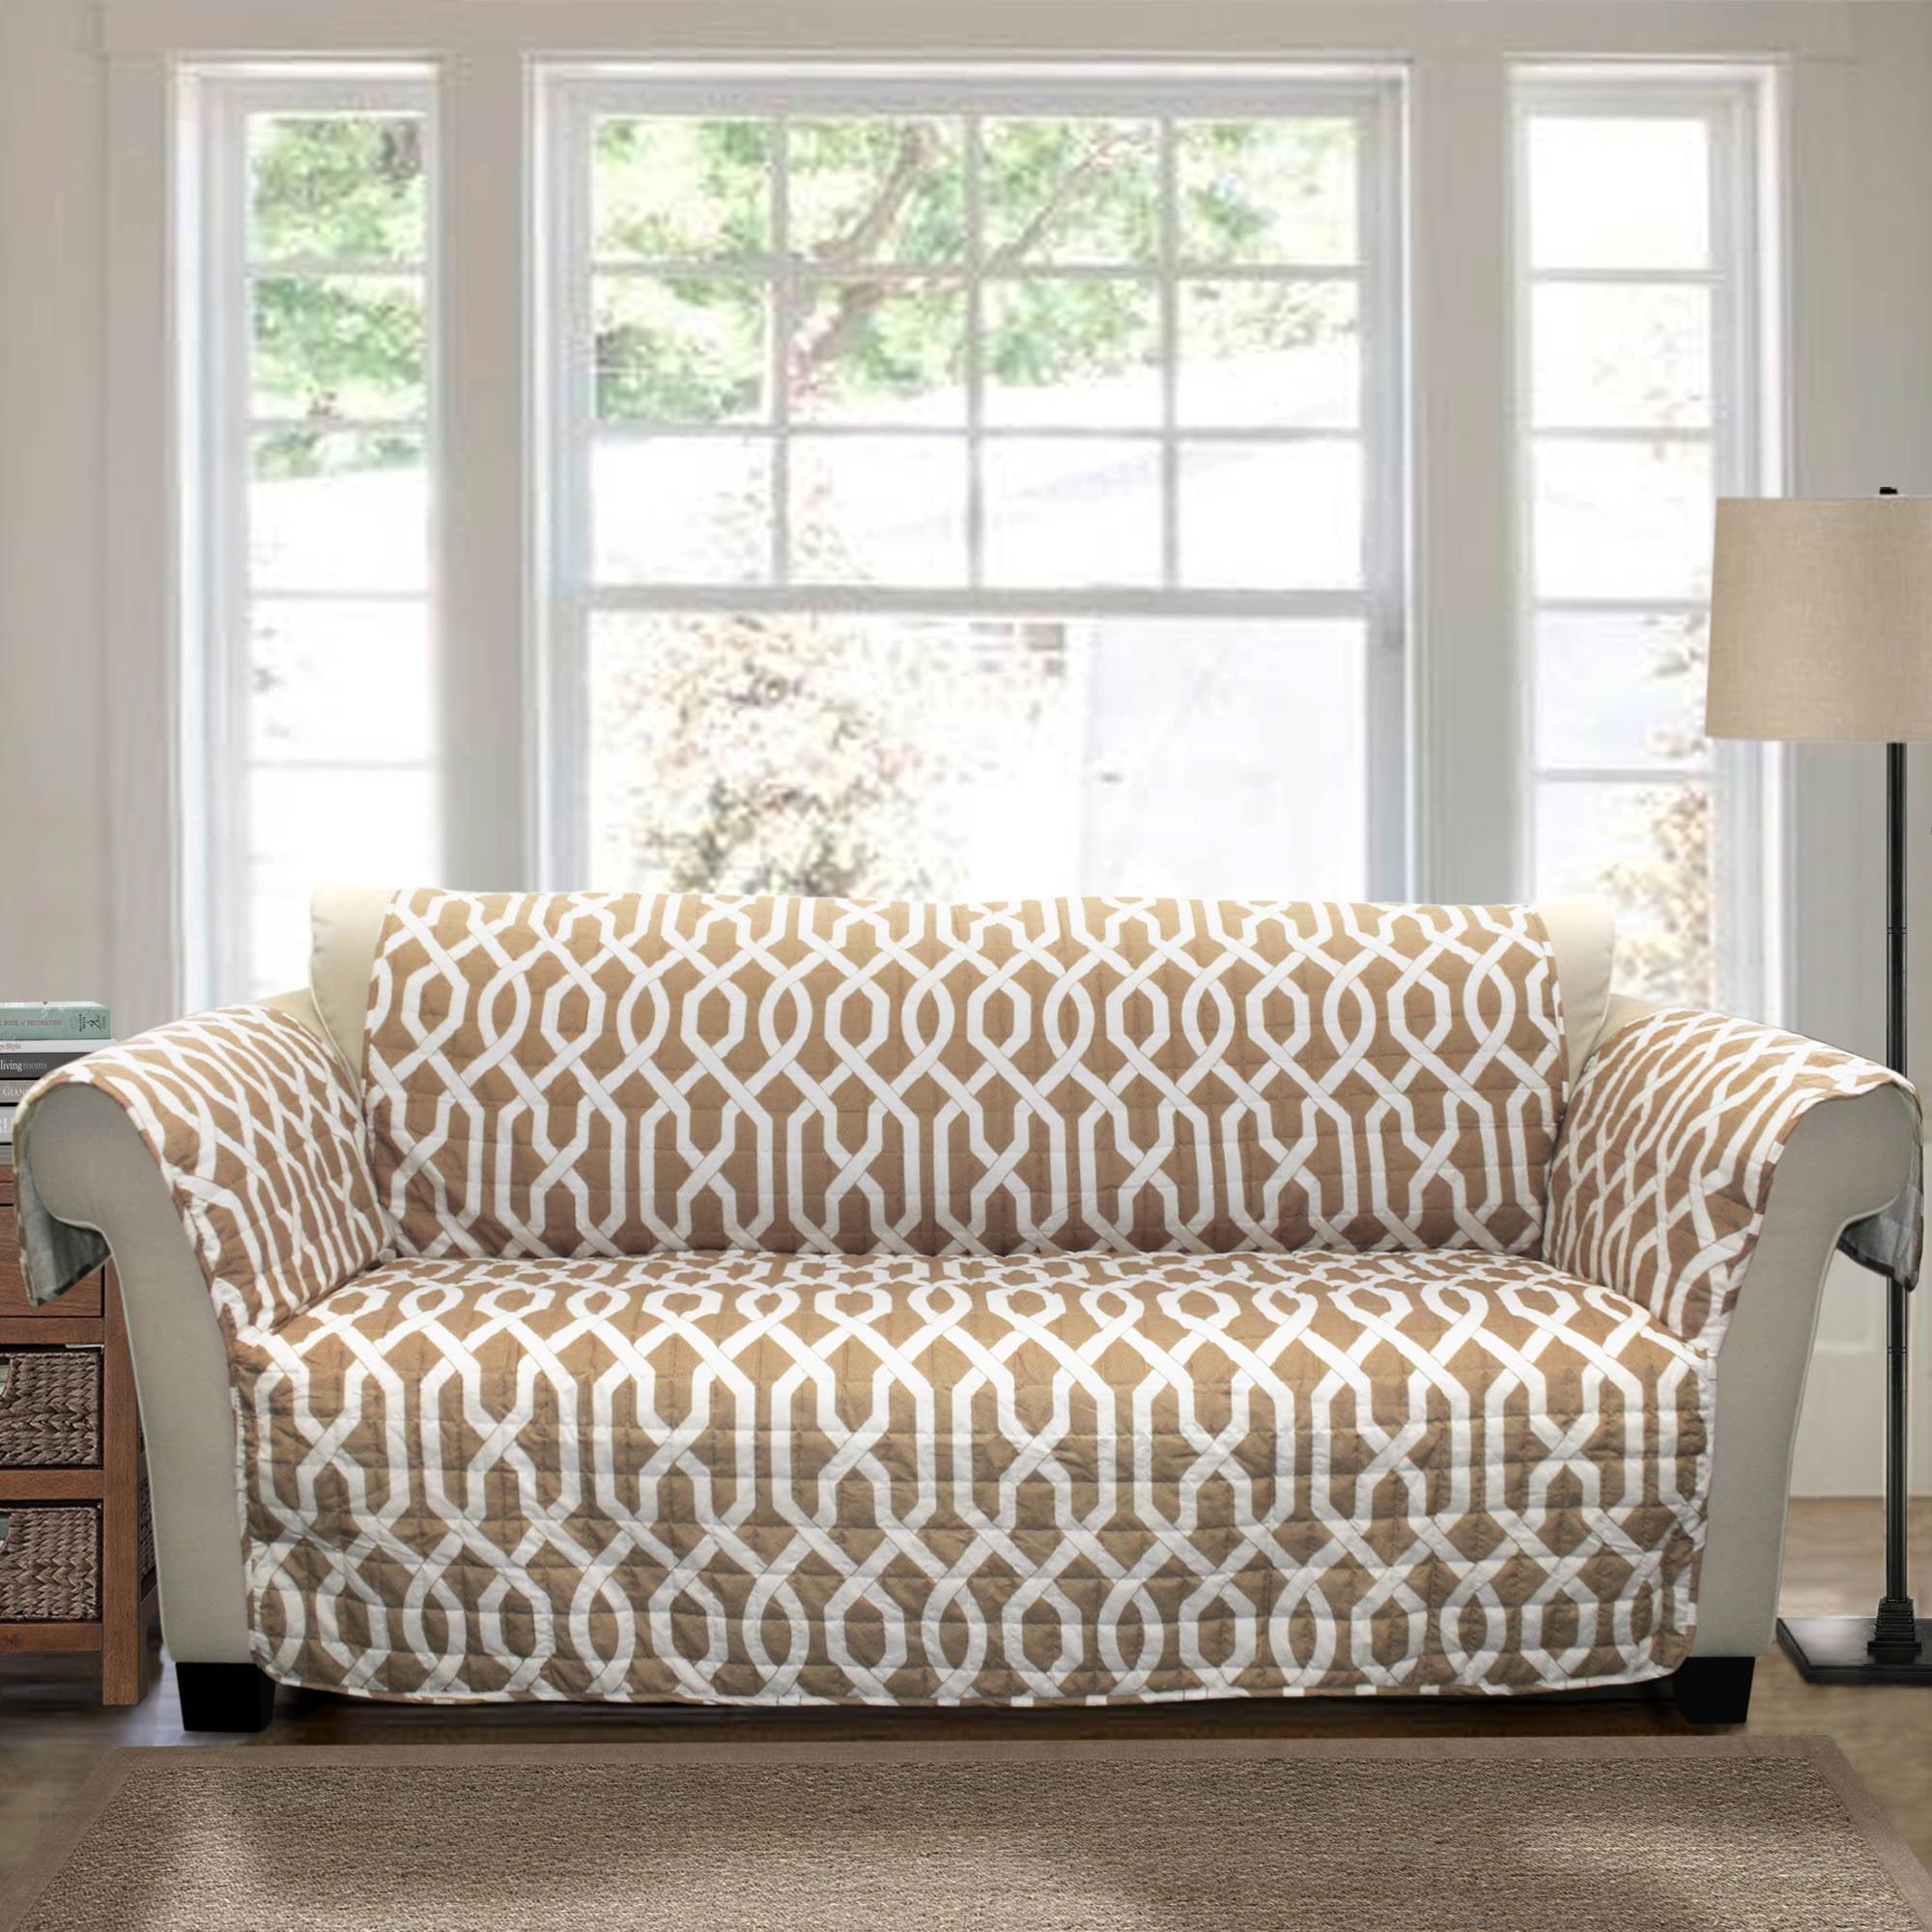 Edward Trellis Furniture Protector Taupe Walmart